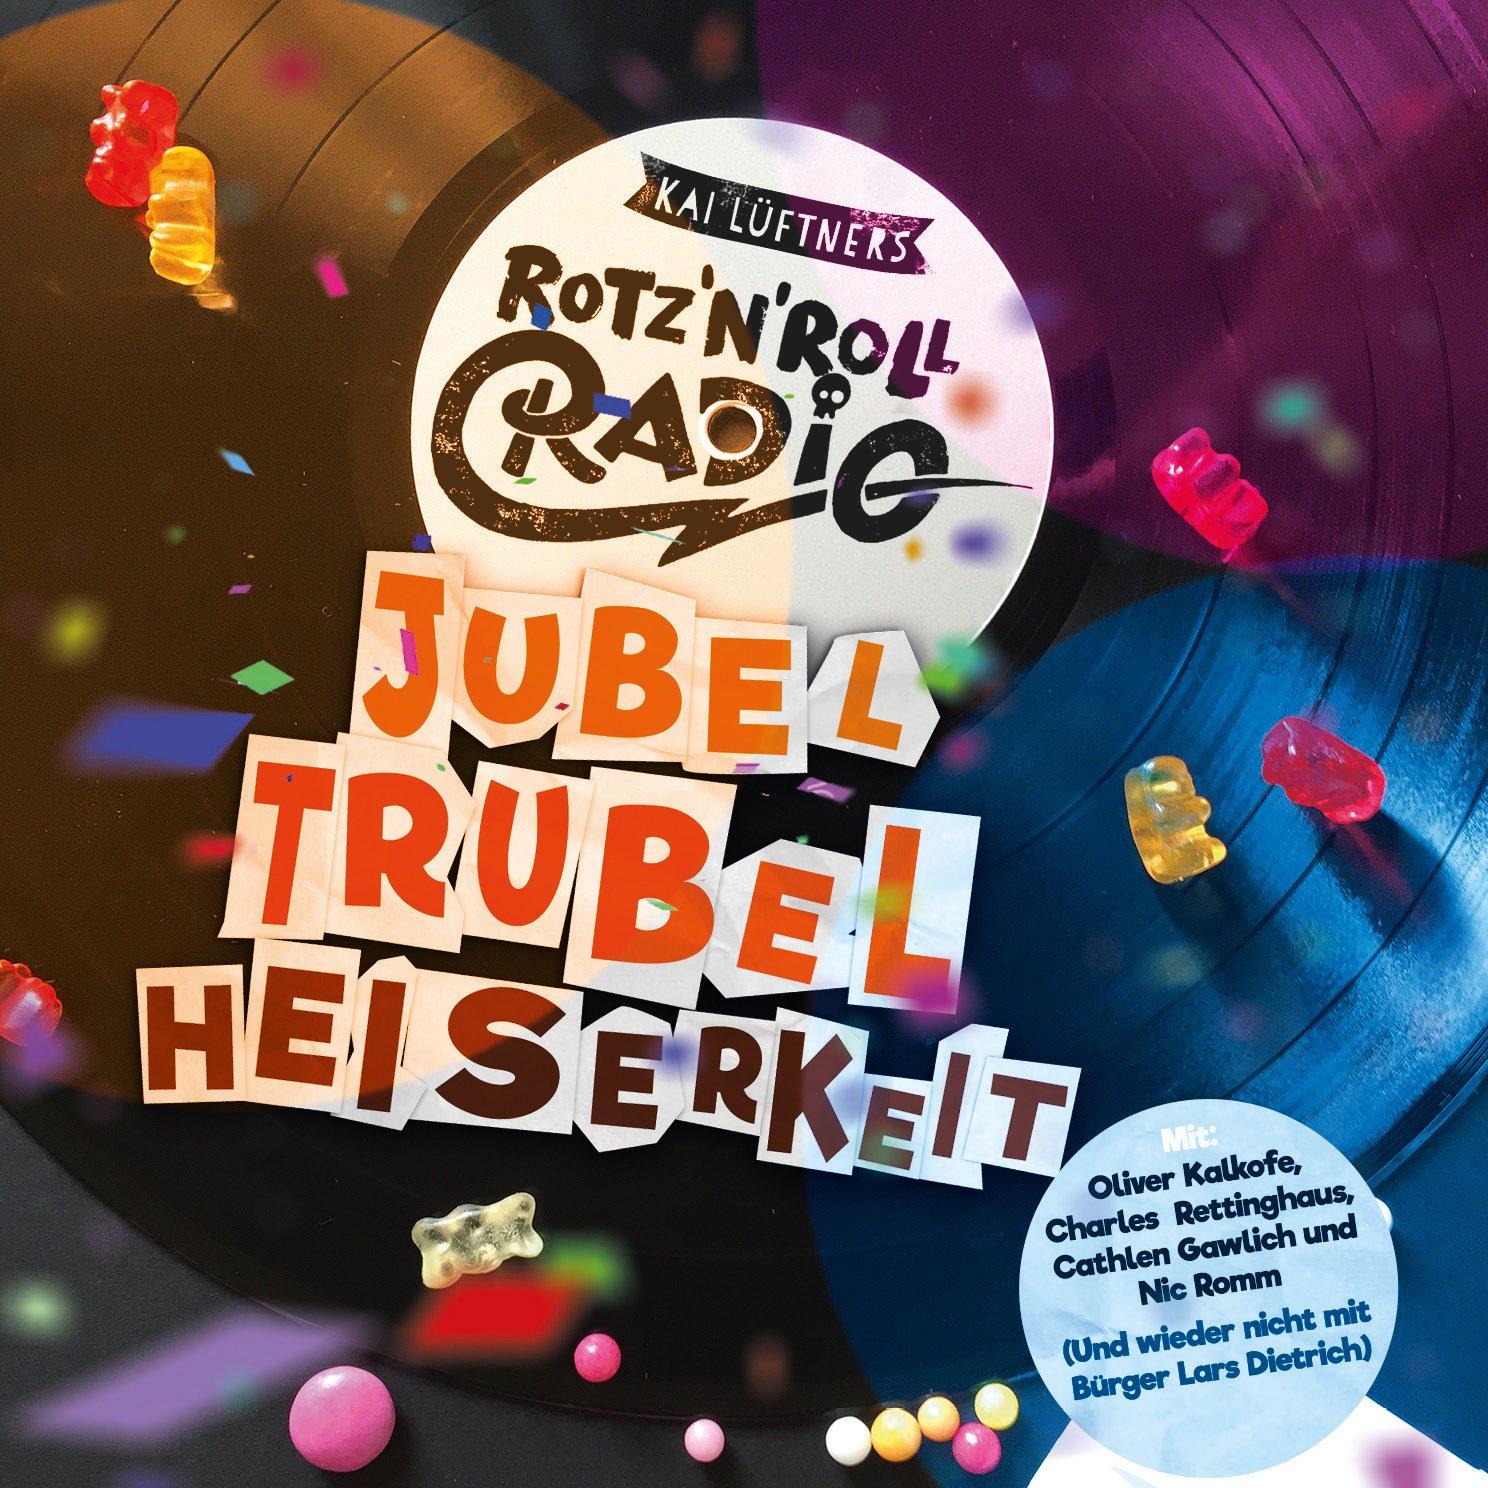 rotz-n-roll-radio-jubel-trubel-heiserkeit